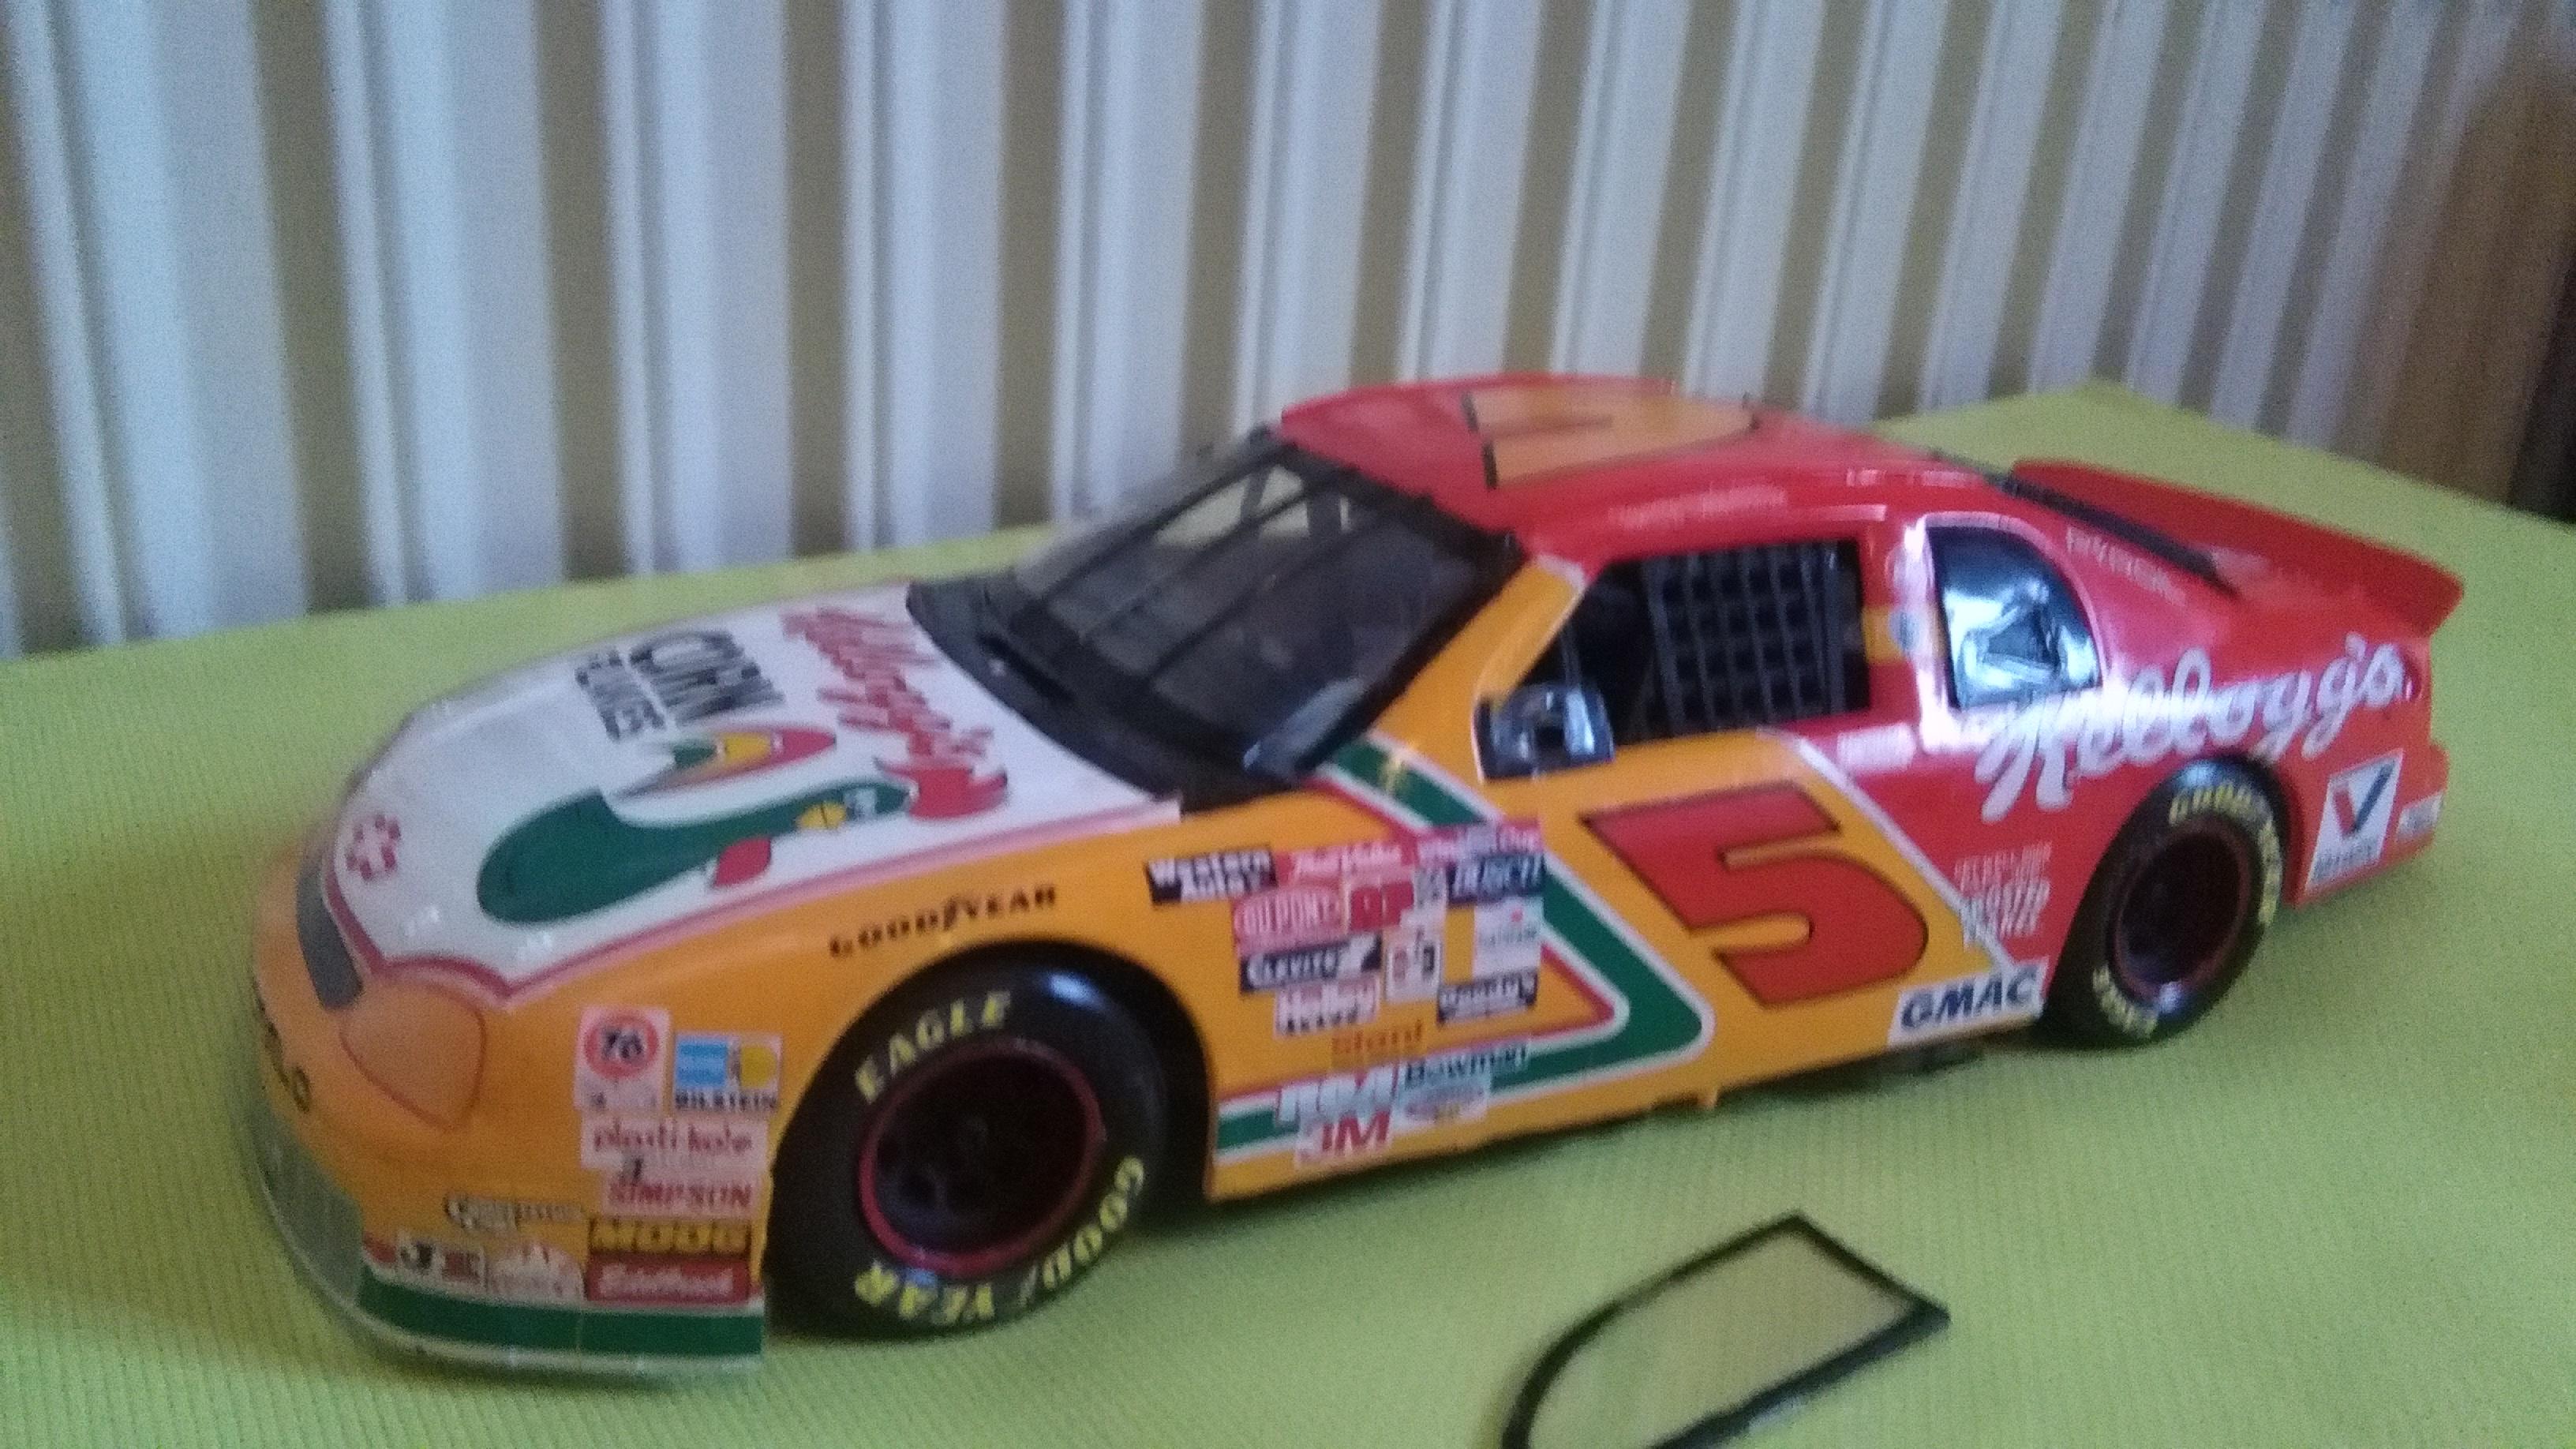 Chevy Monte-Carlo 1998 #32 Jeff Green Kleenex-Cottonelle   156006IMG20160207171148